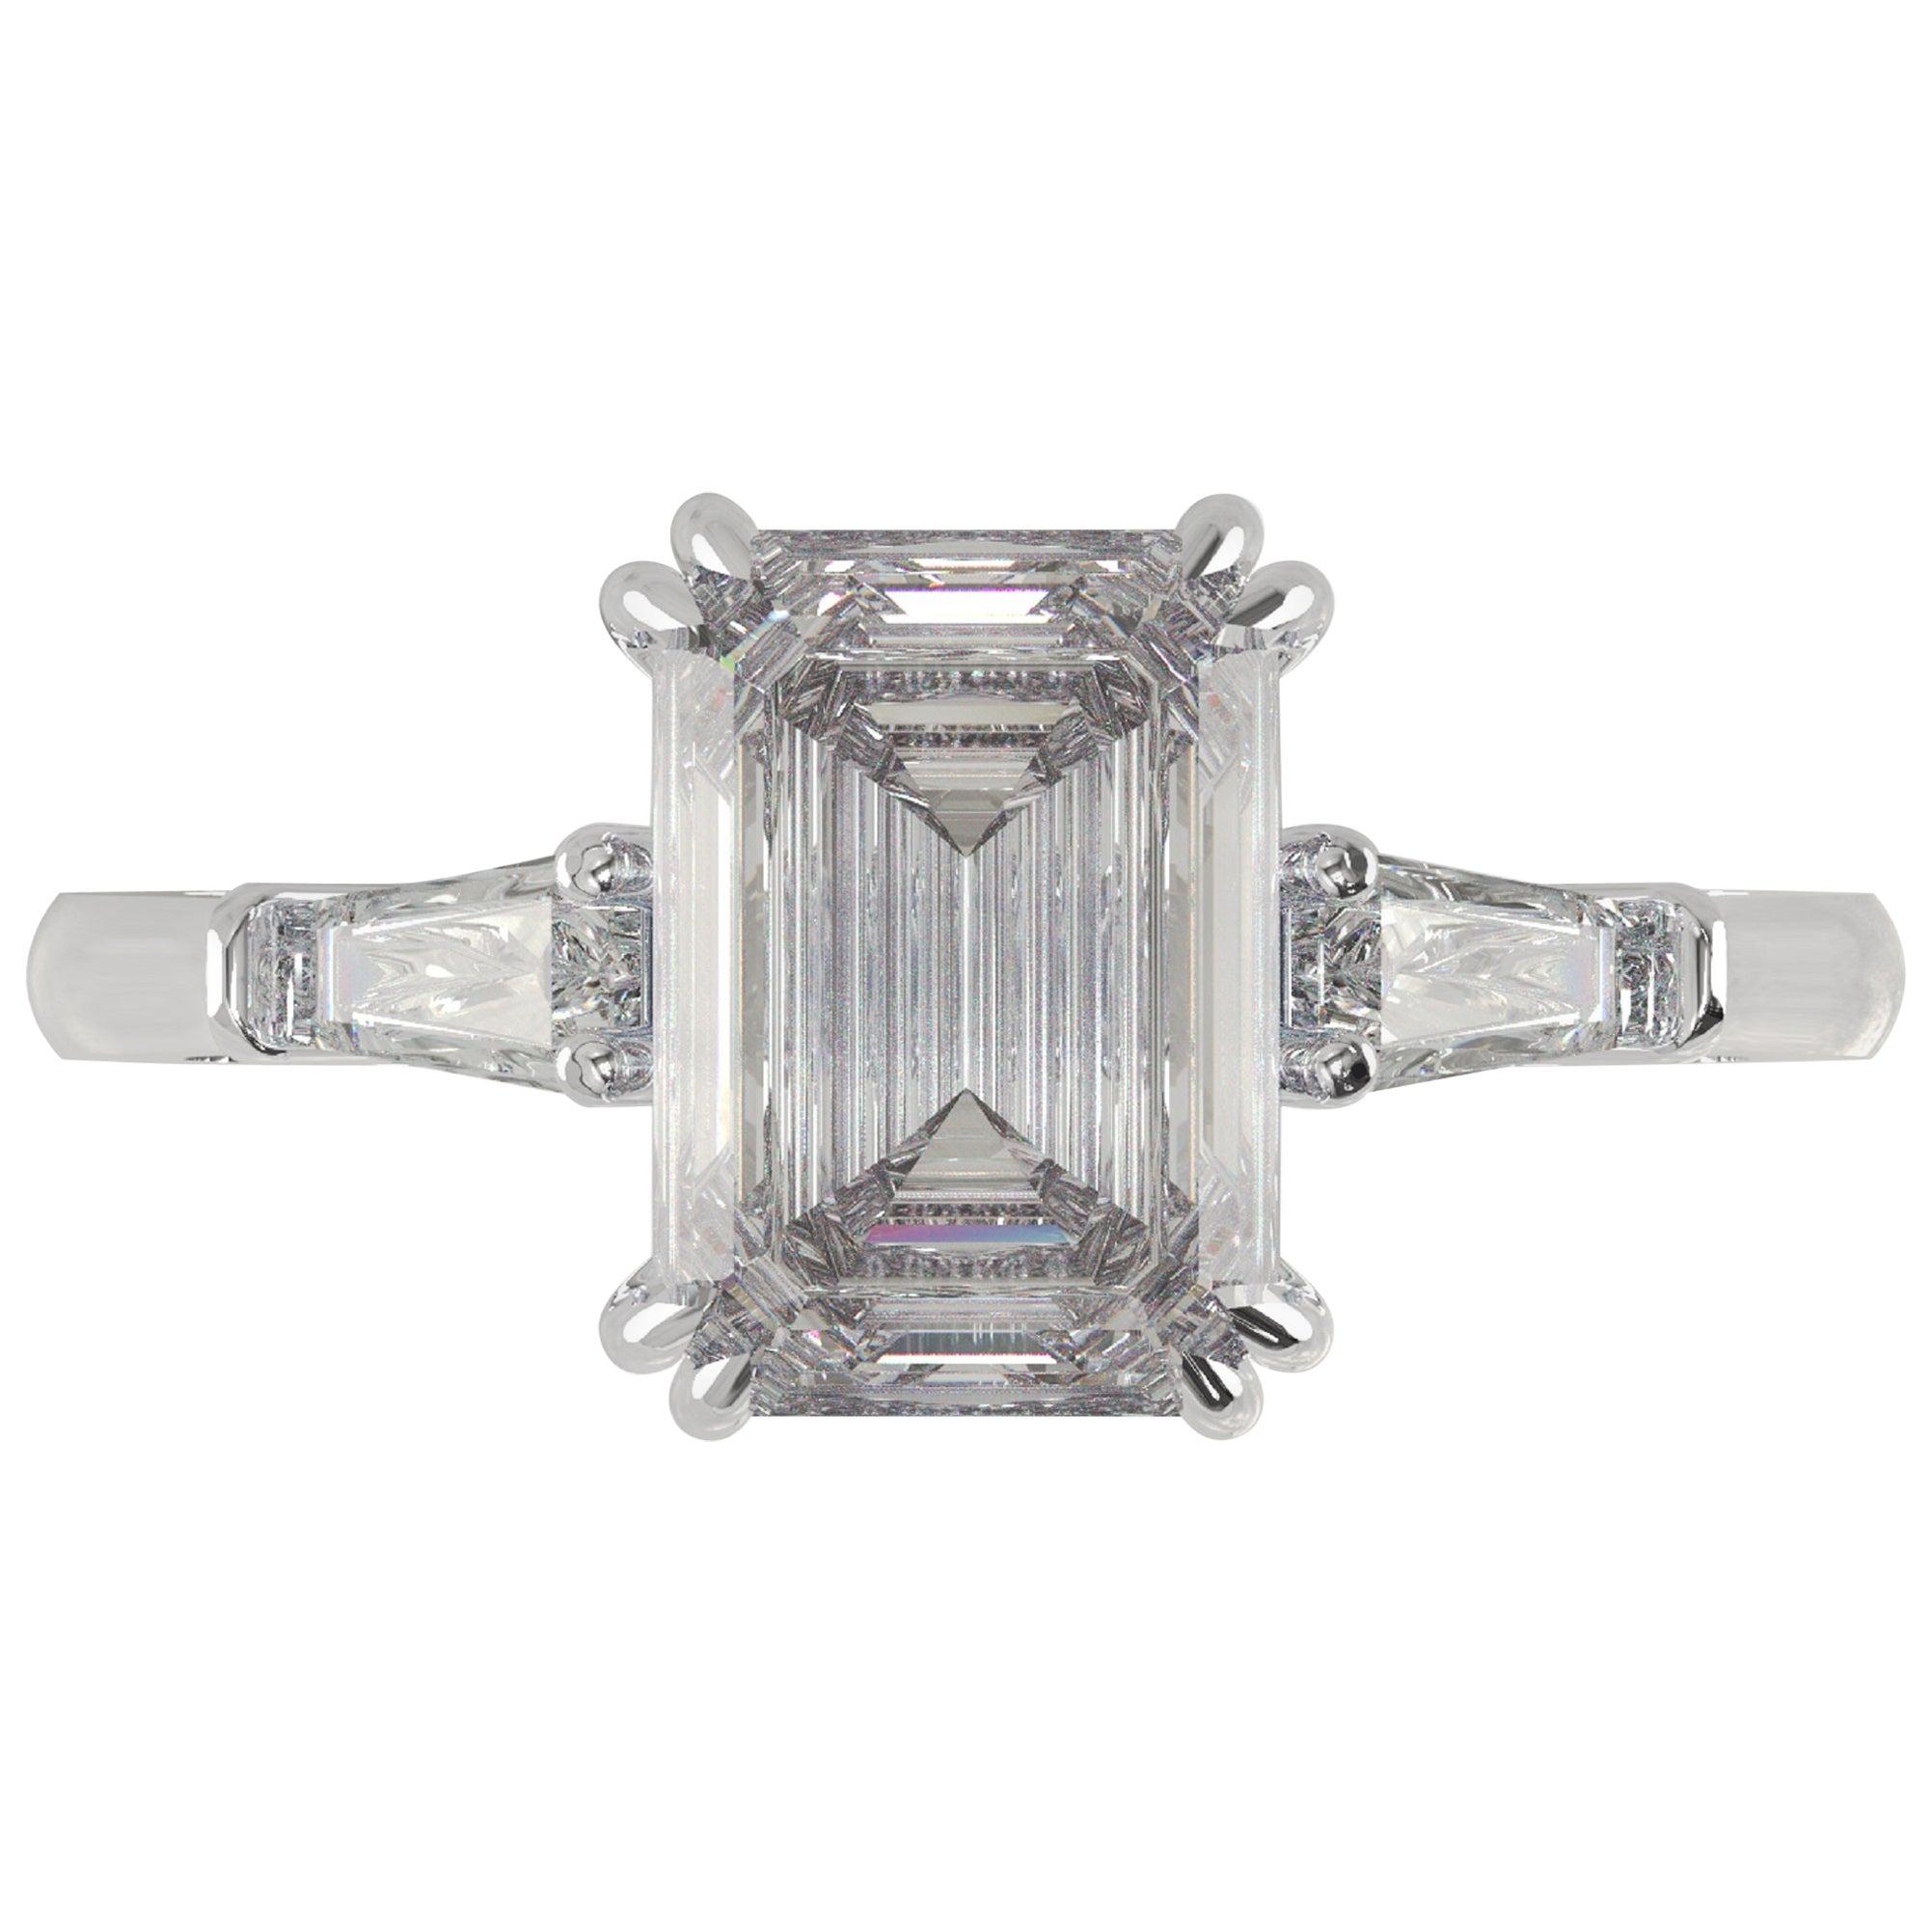 GIA Certified 1.81 Carat Emerald Cut Diamond Ring